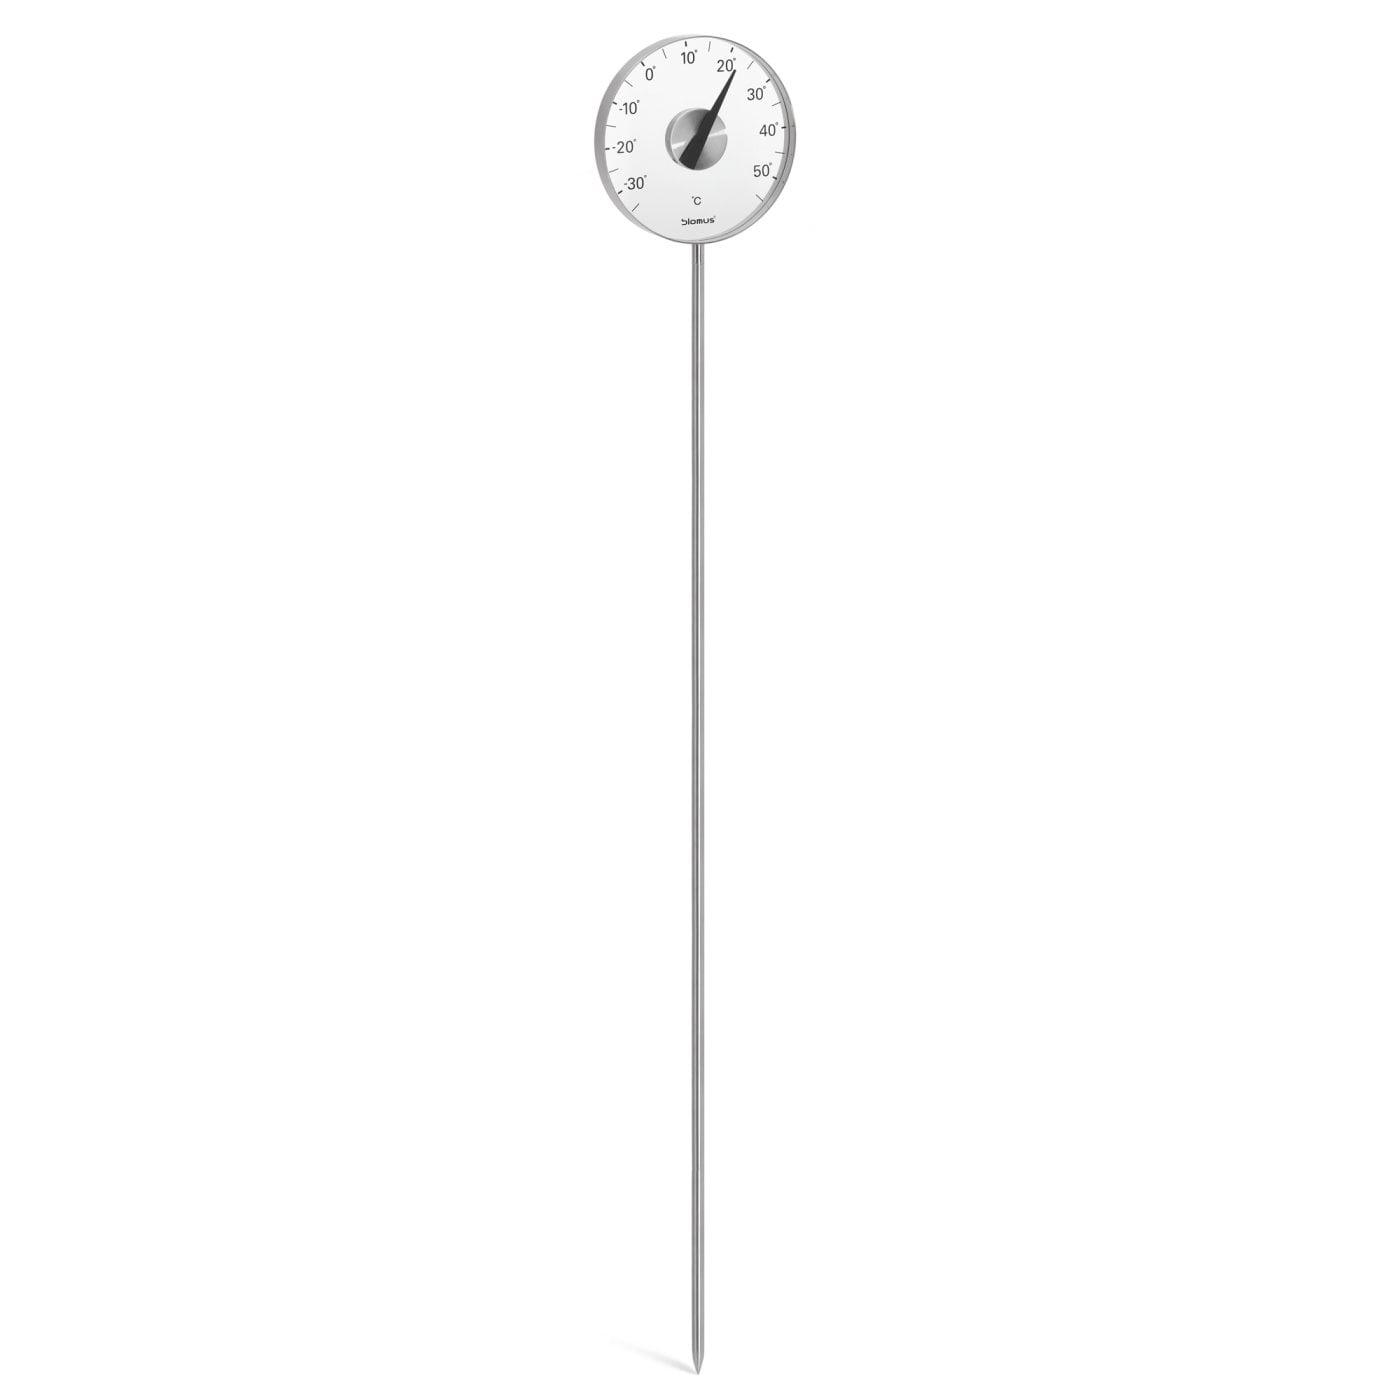 Thermomètre De Jardin Celsius intérieur Thermometre De Jardin